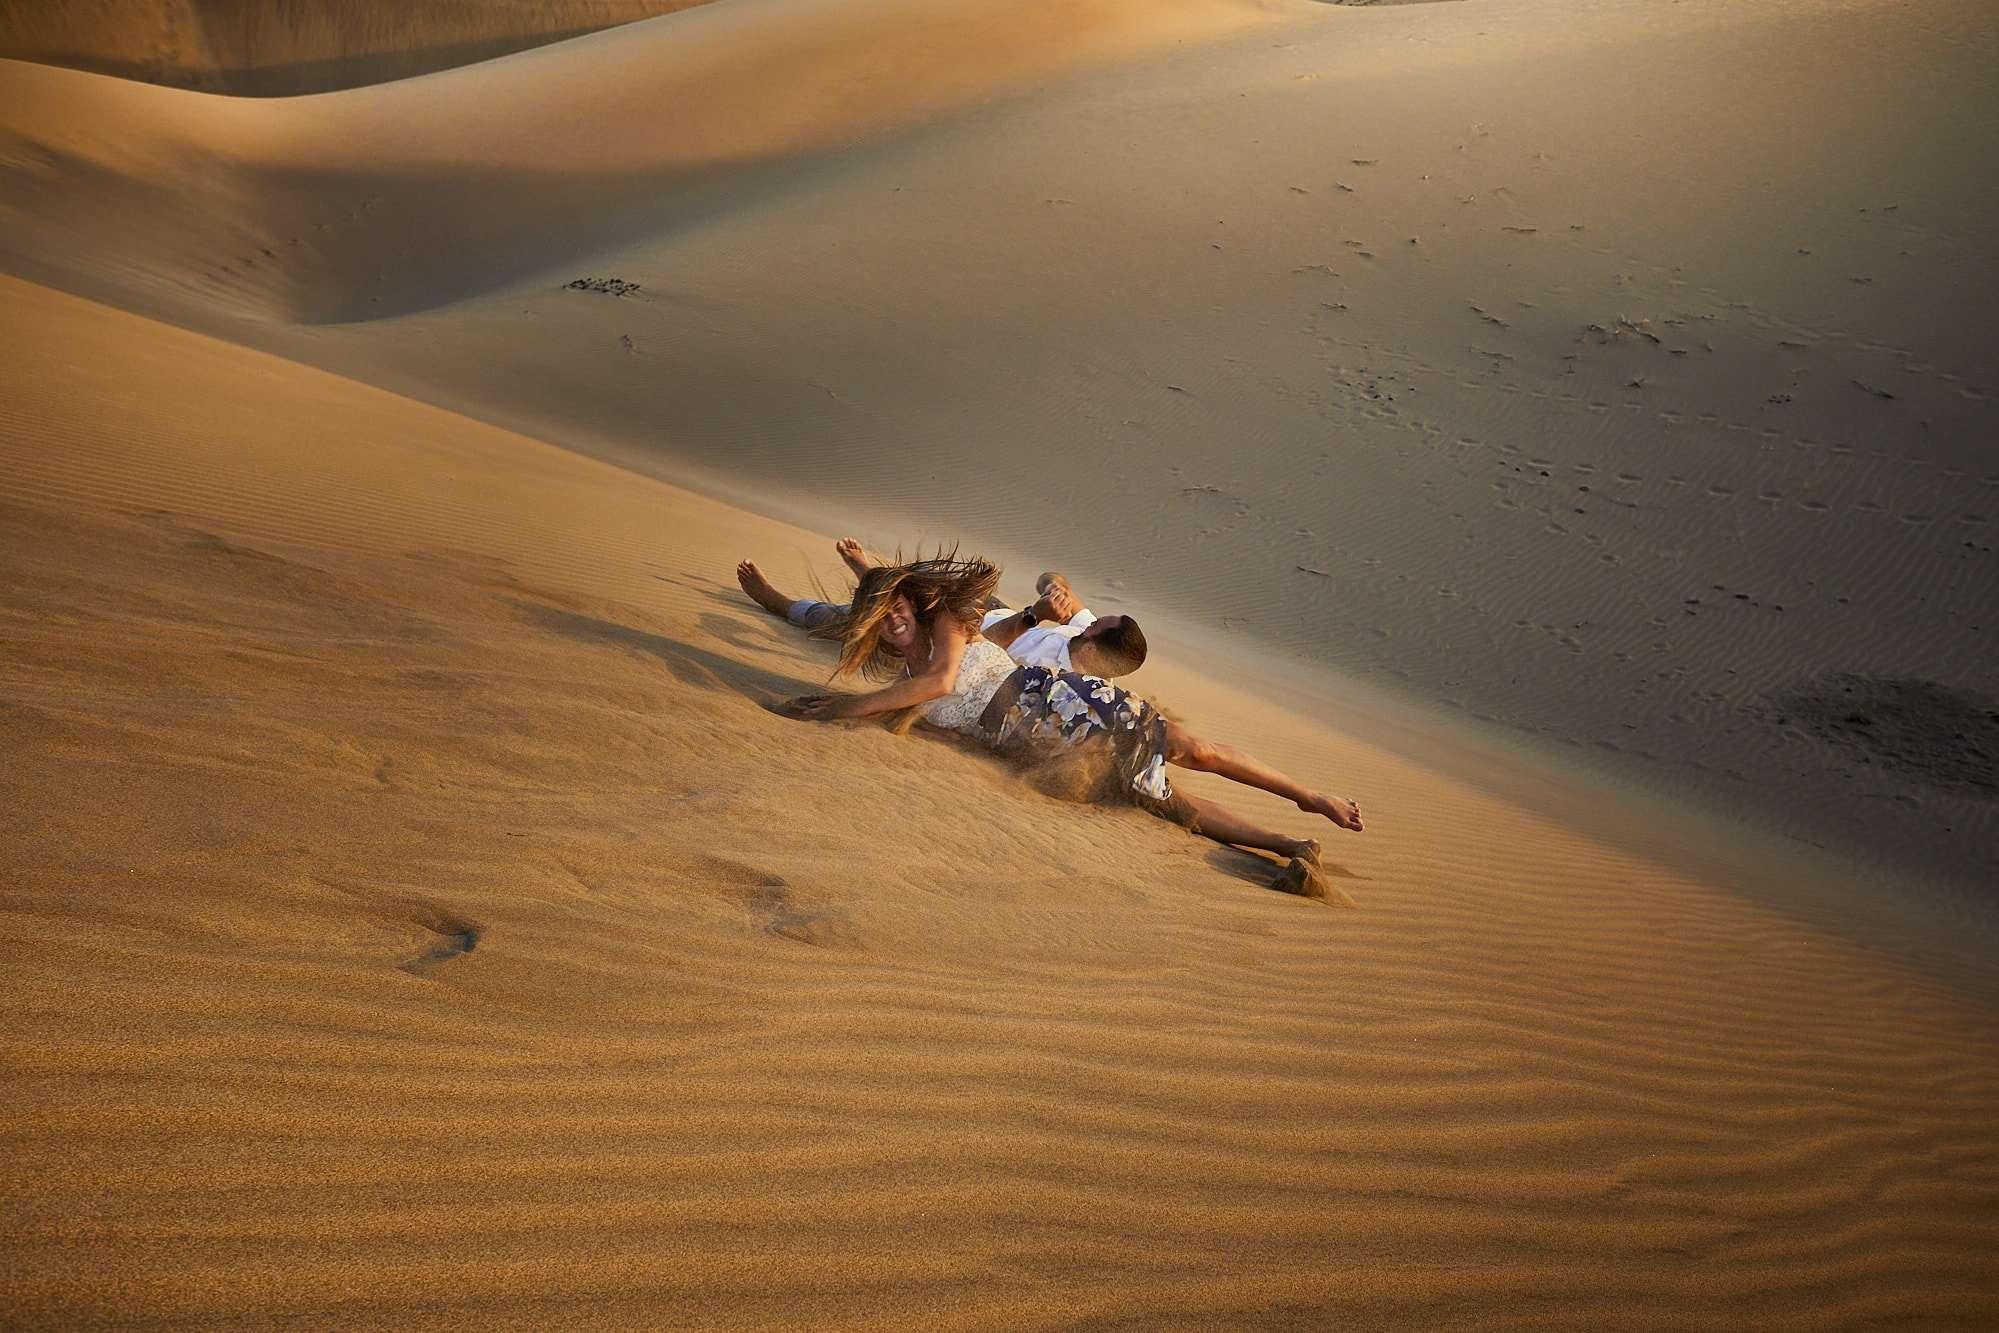 Sesión preboda en las dunas